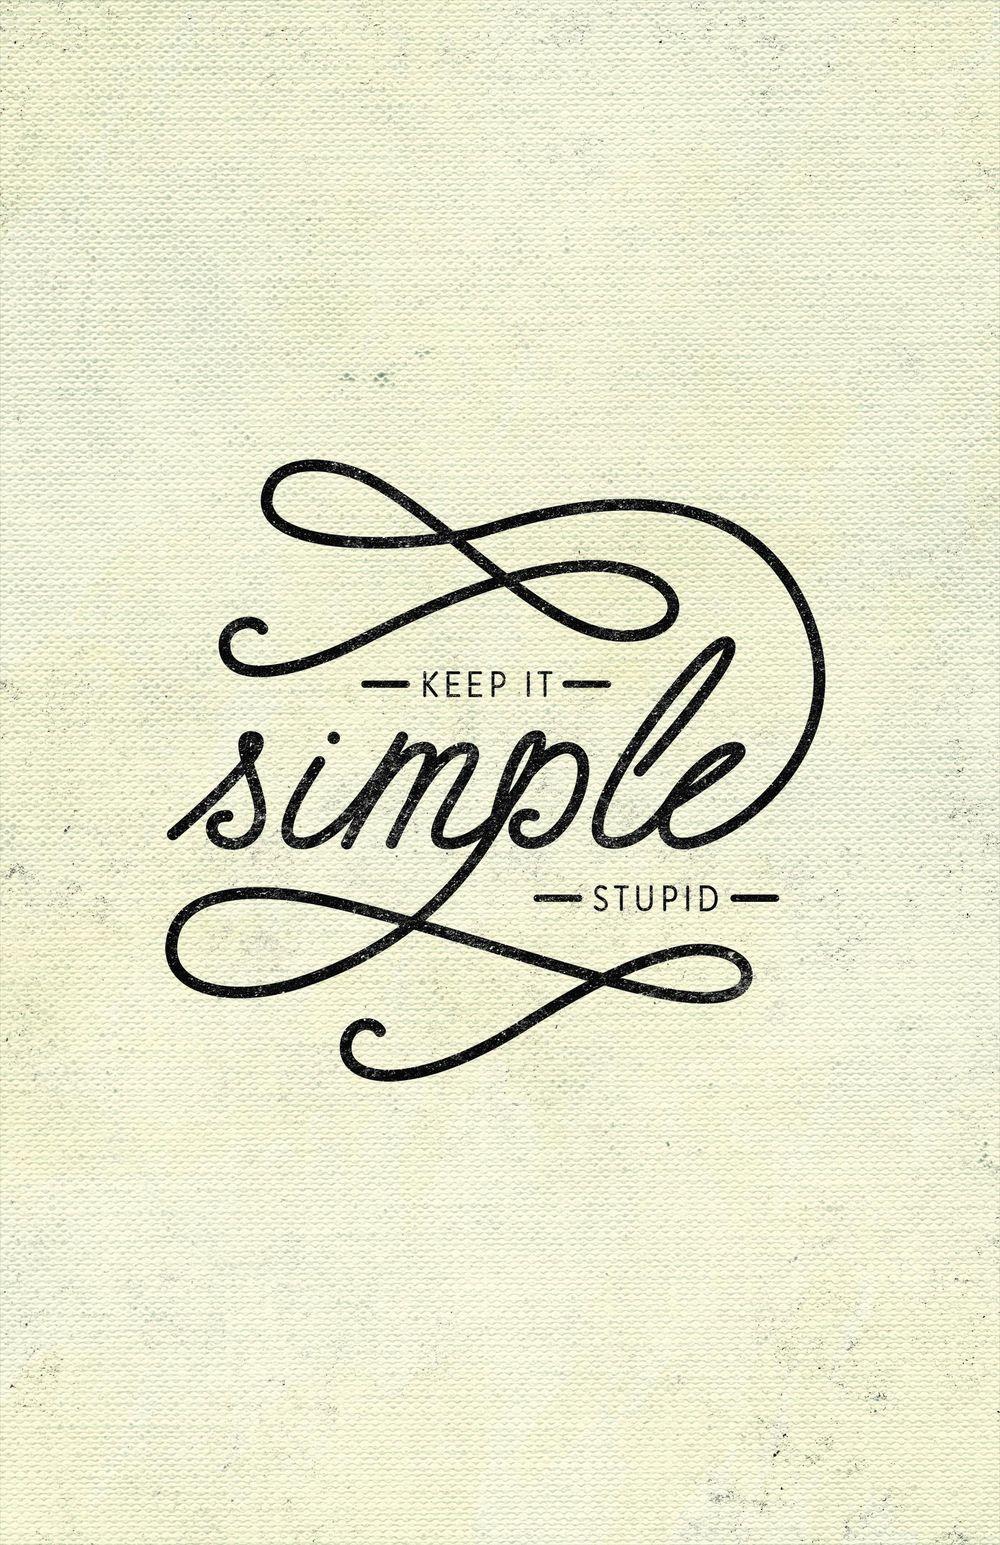 K.I.S.S Keep It Simple Stupid - image 1 - student project